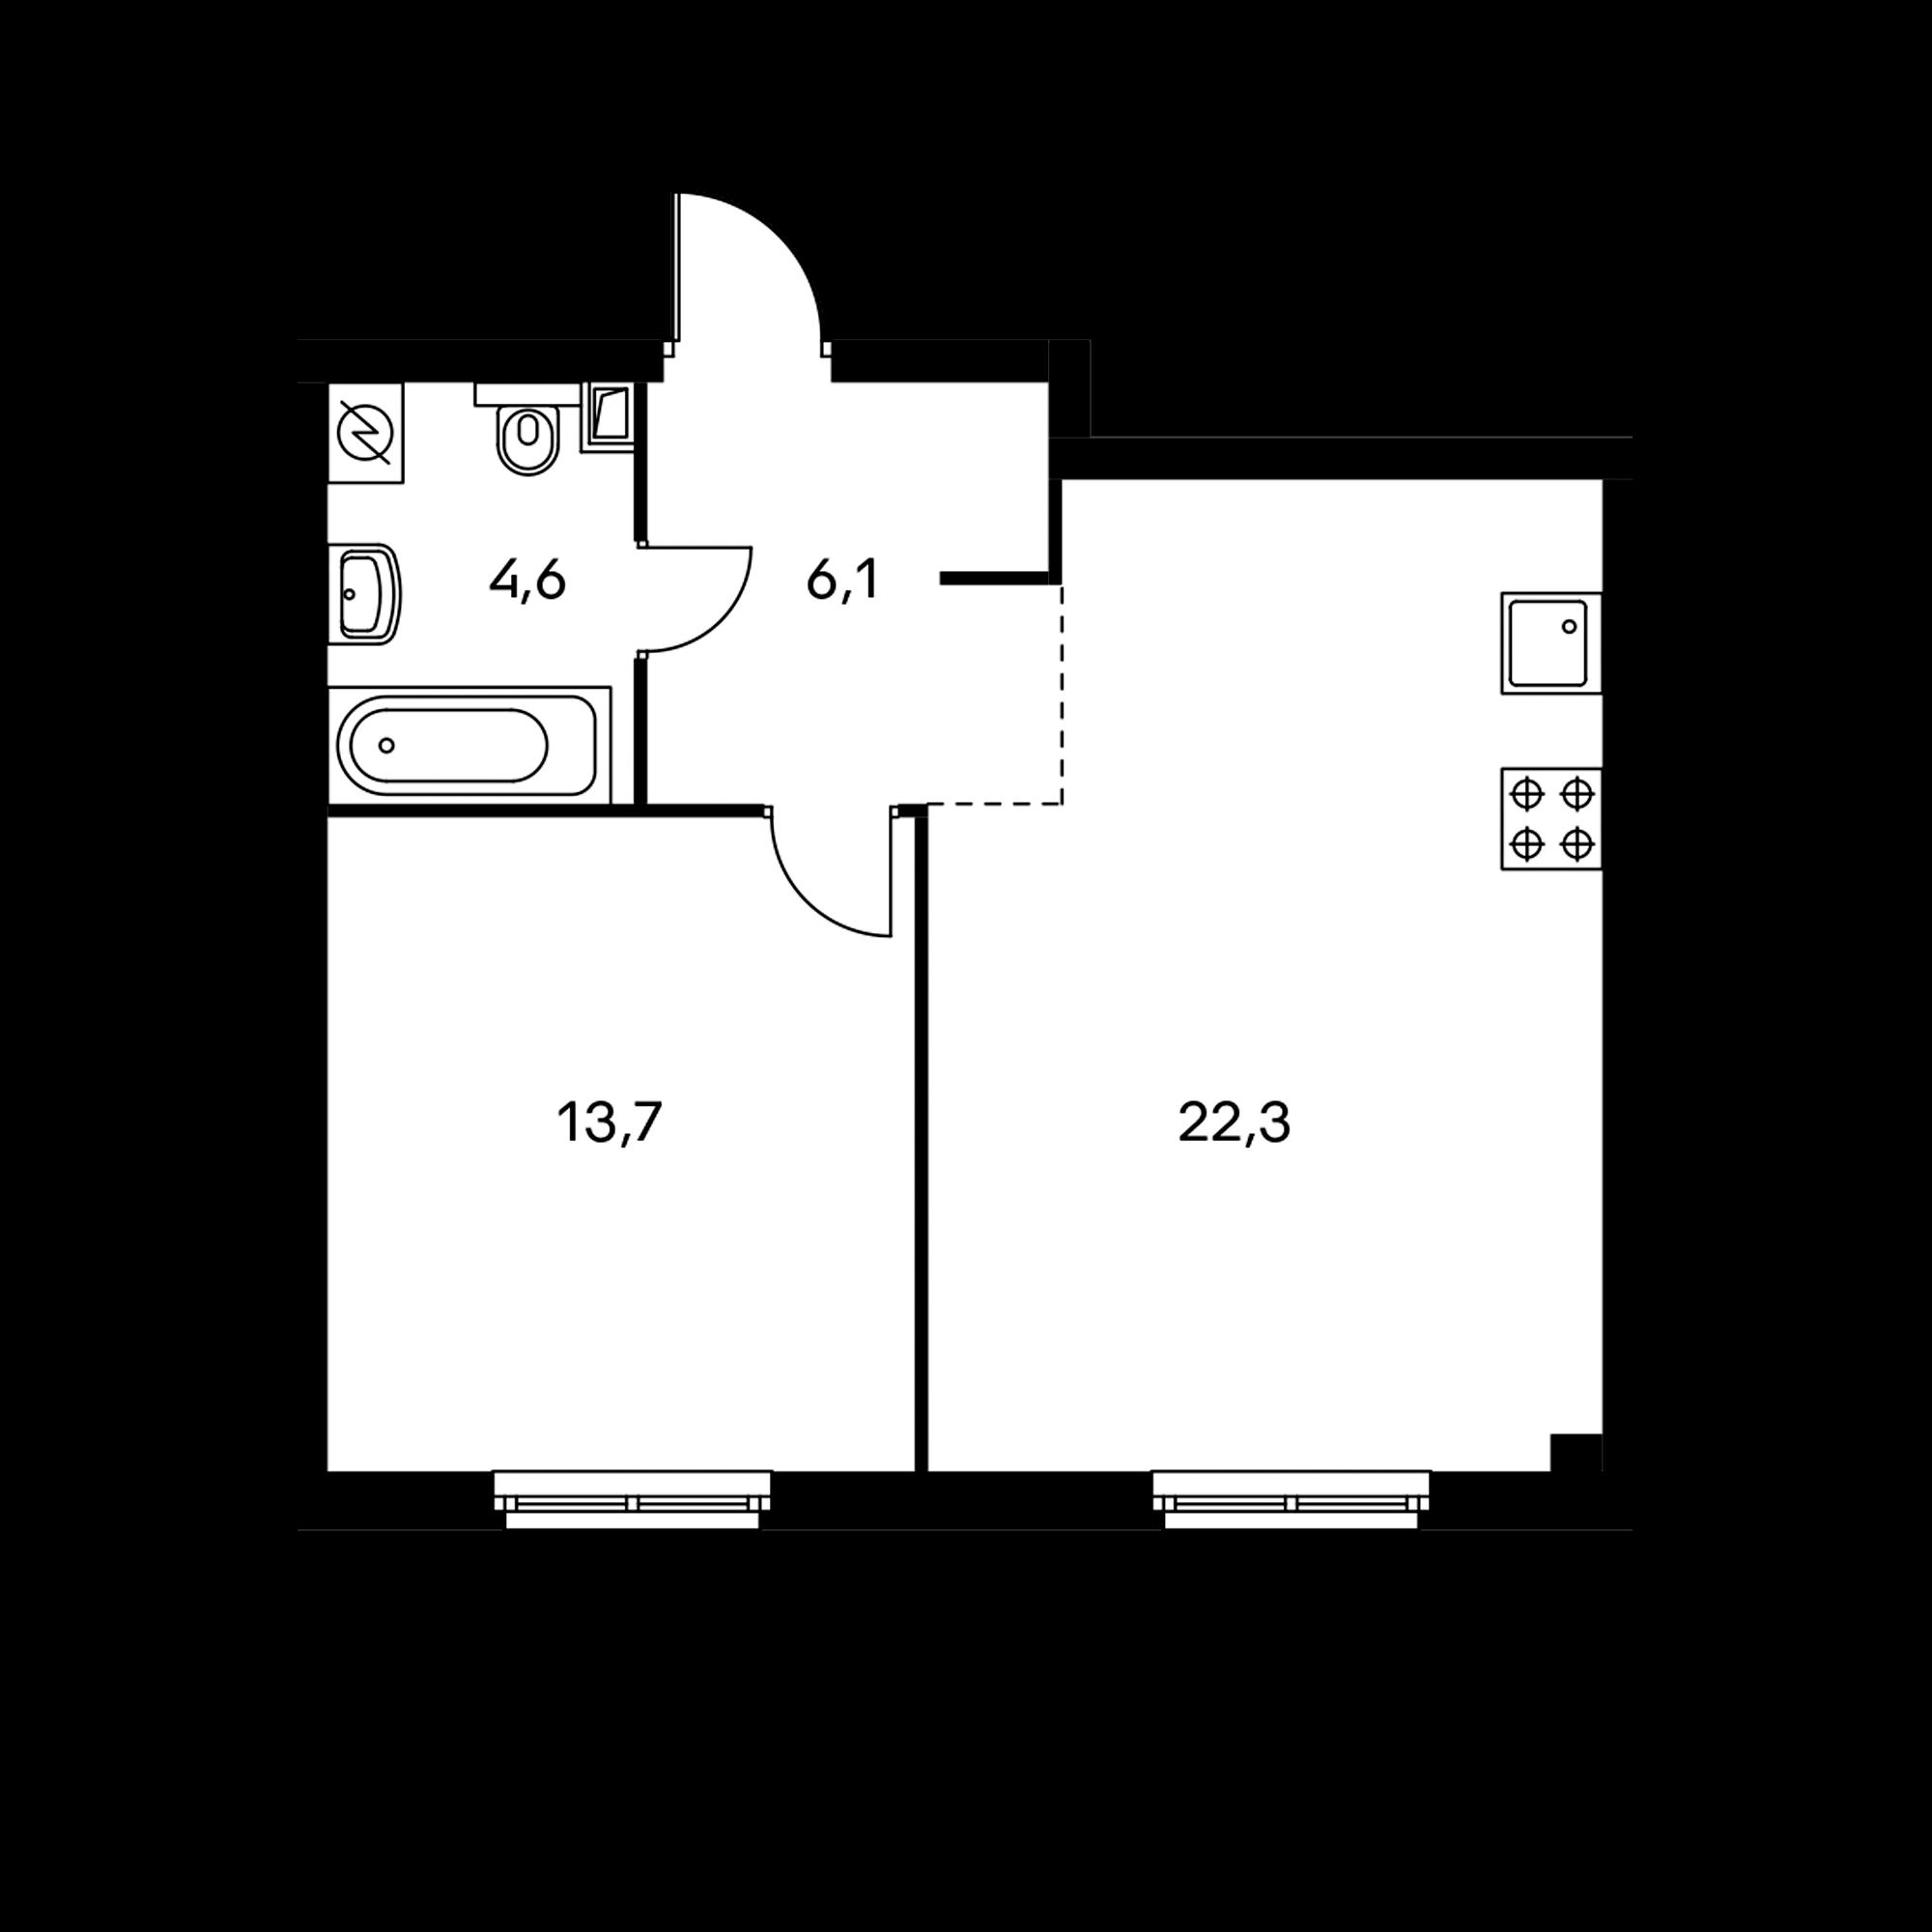 1EL3_7.8